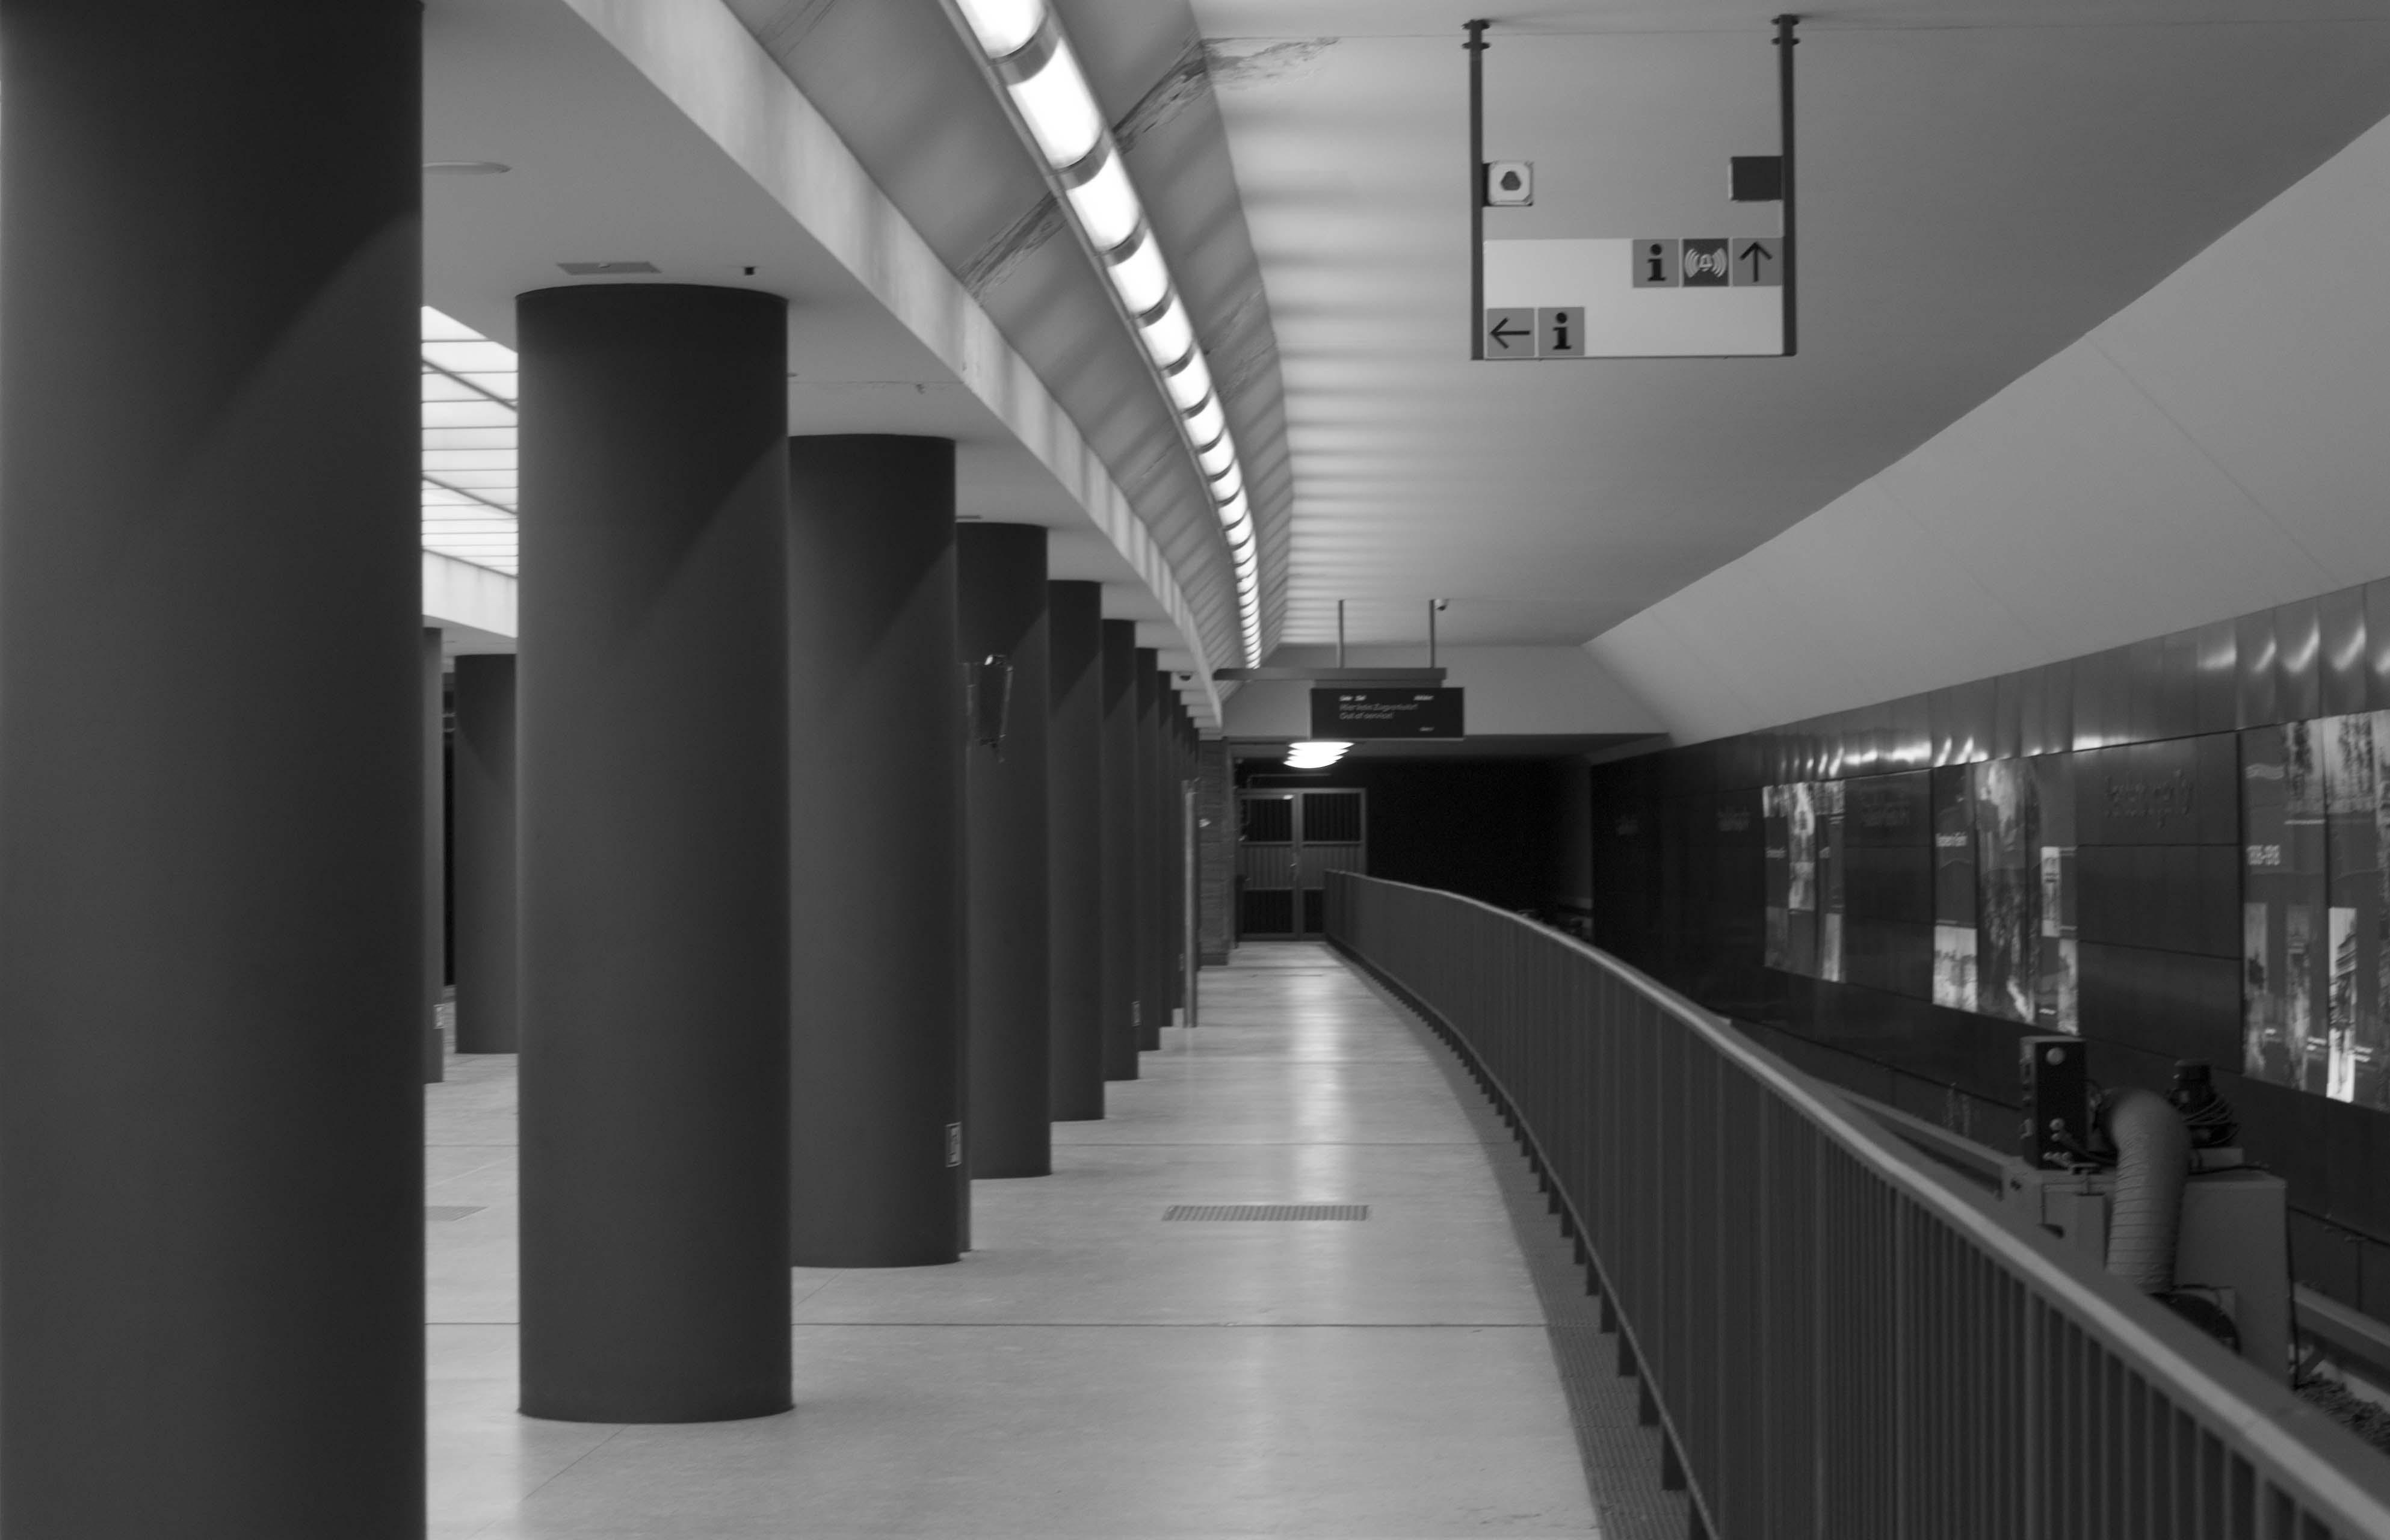 Light Black And White Architecture Perspective Subway Metro Transport Line Hall Monochrome Public